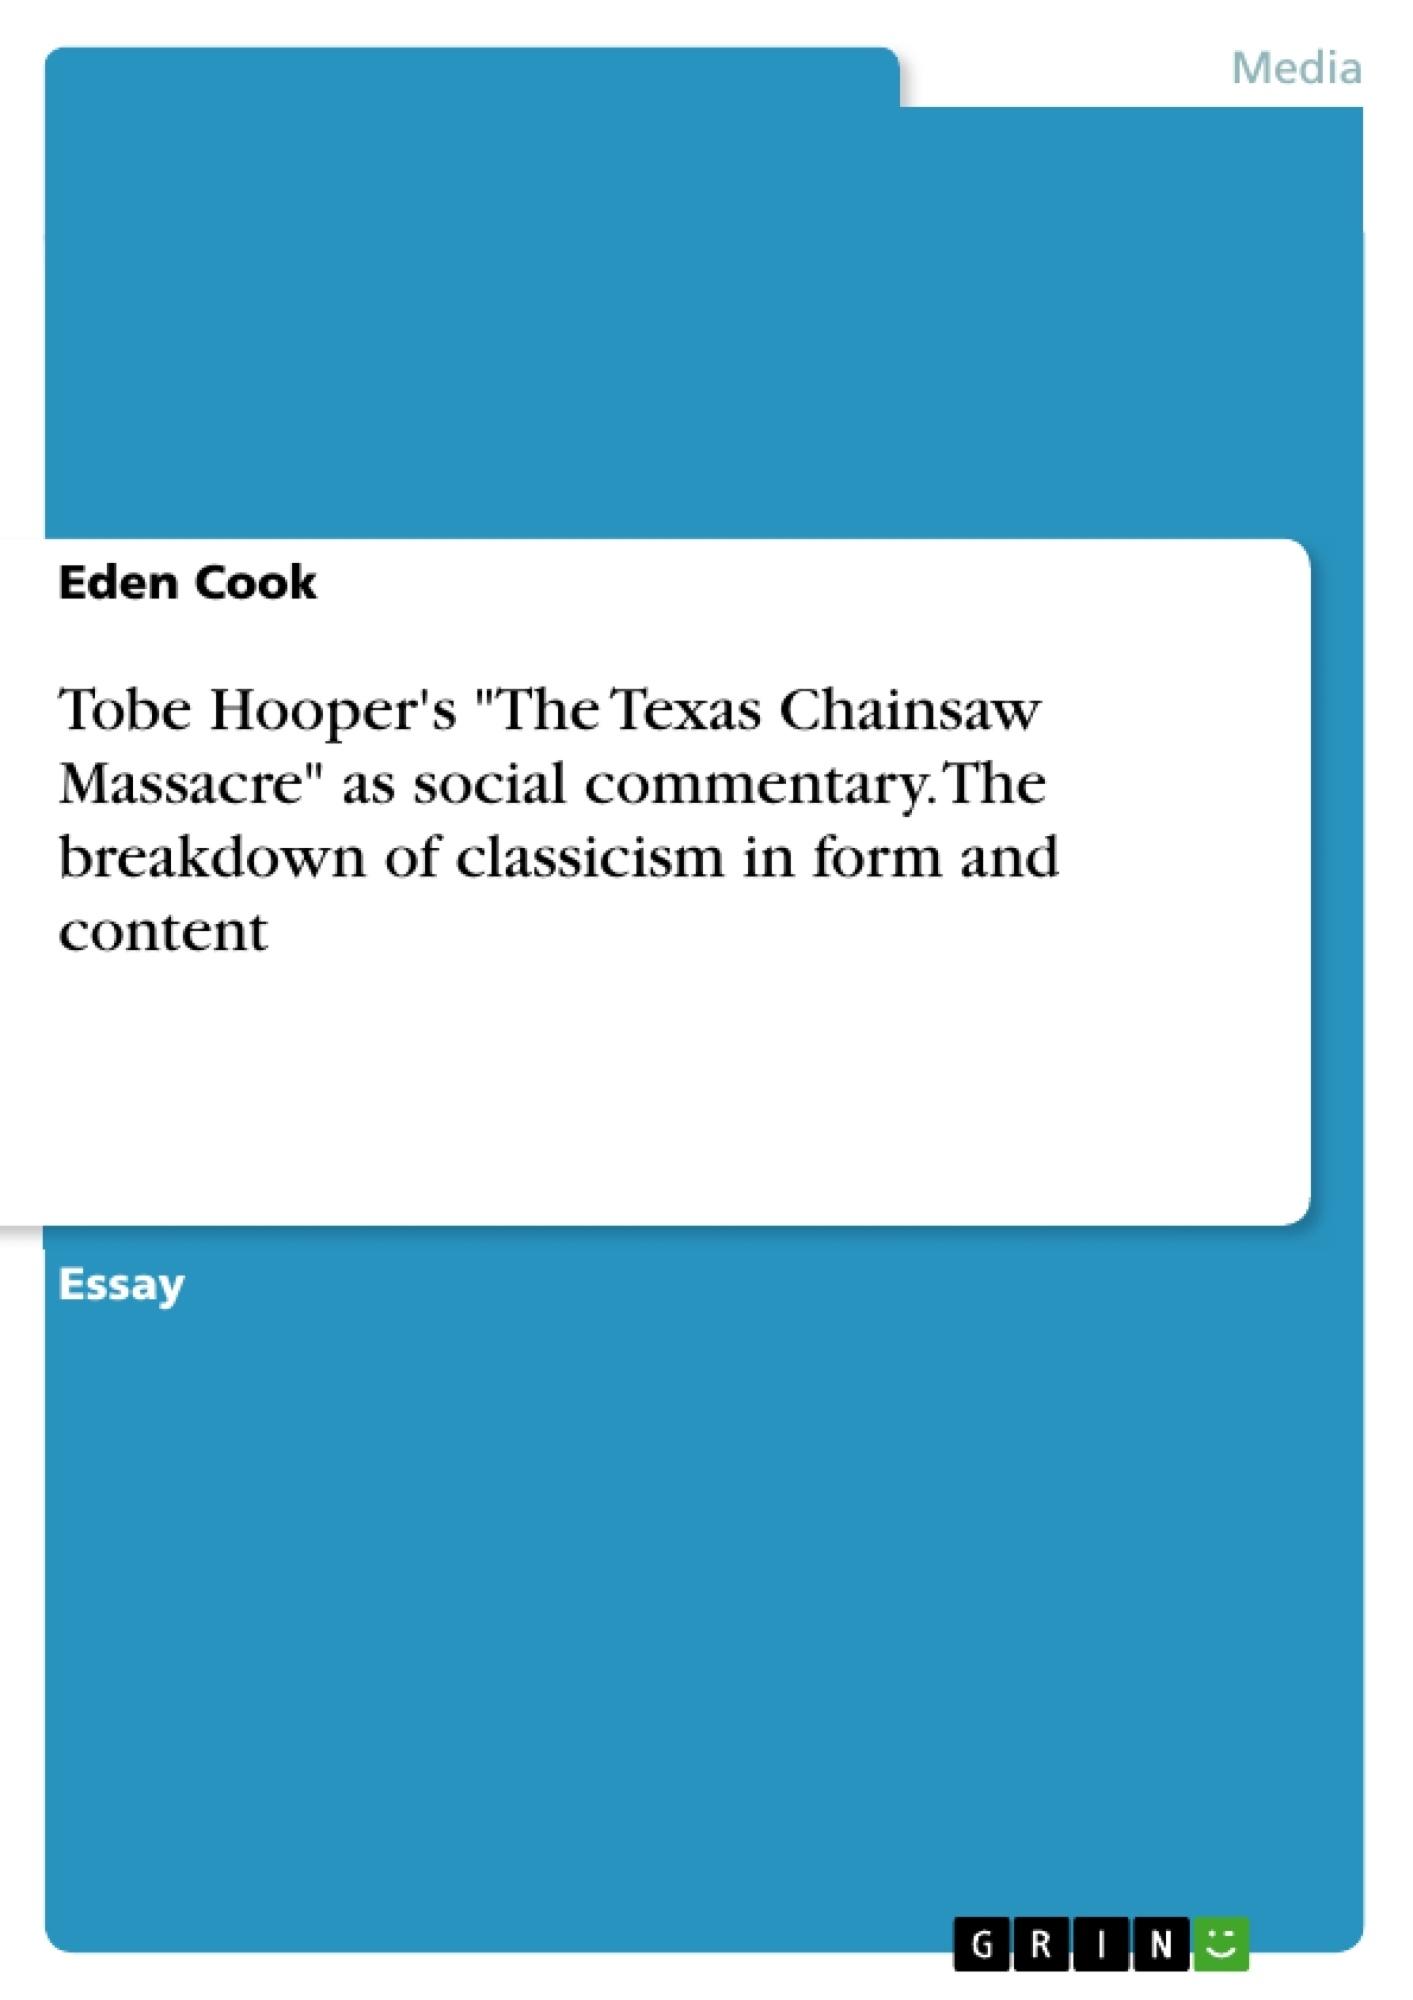 013 323415 0 Essay Example Social Dreaded Commentary Art The Great Gatsby Full